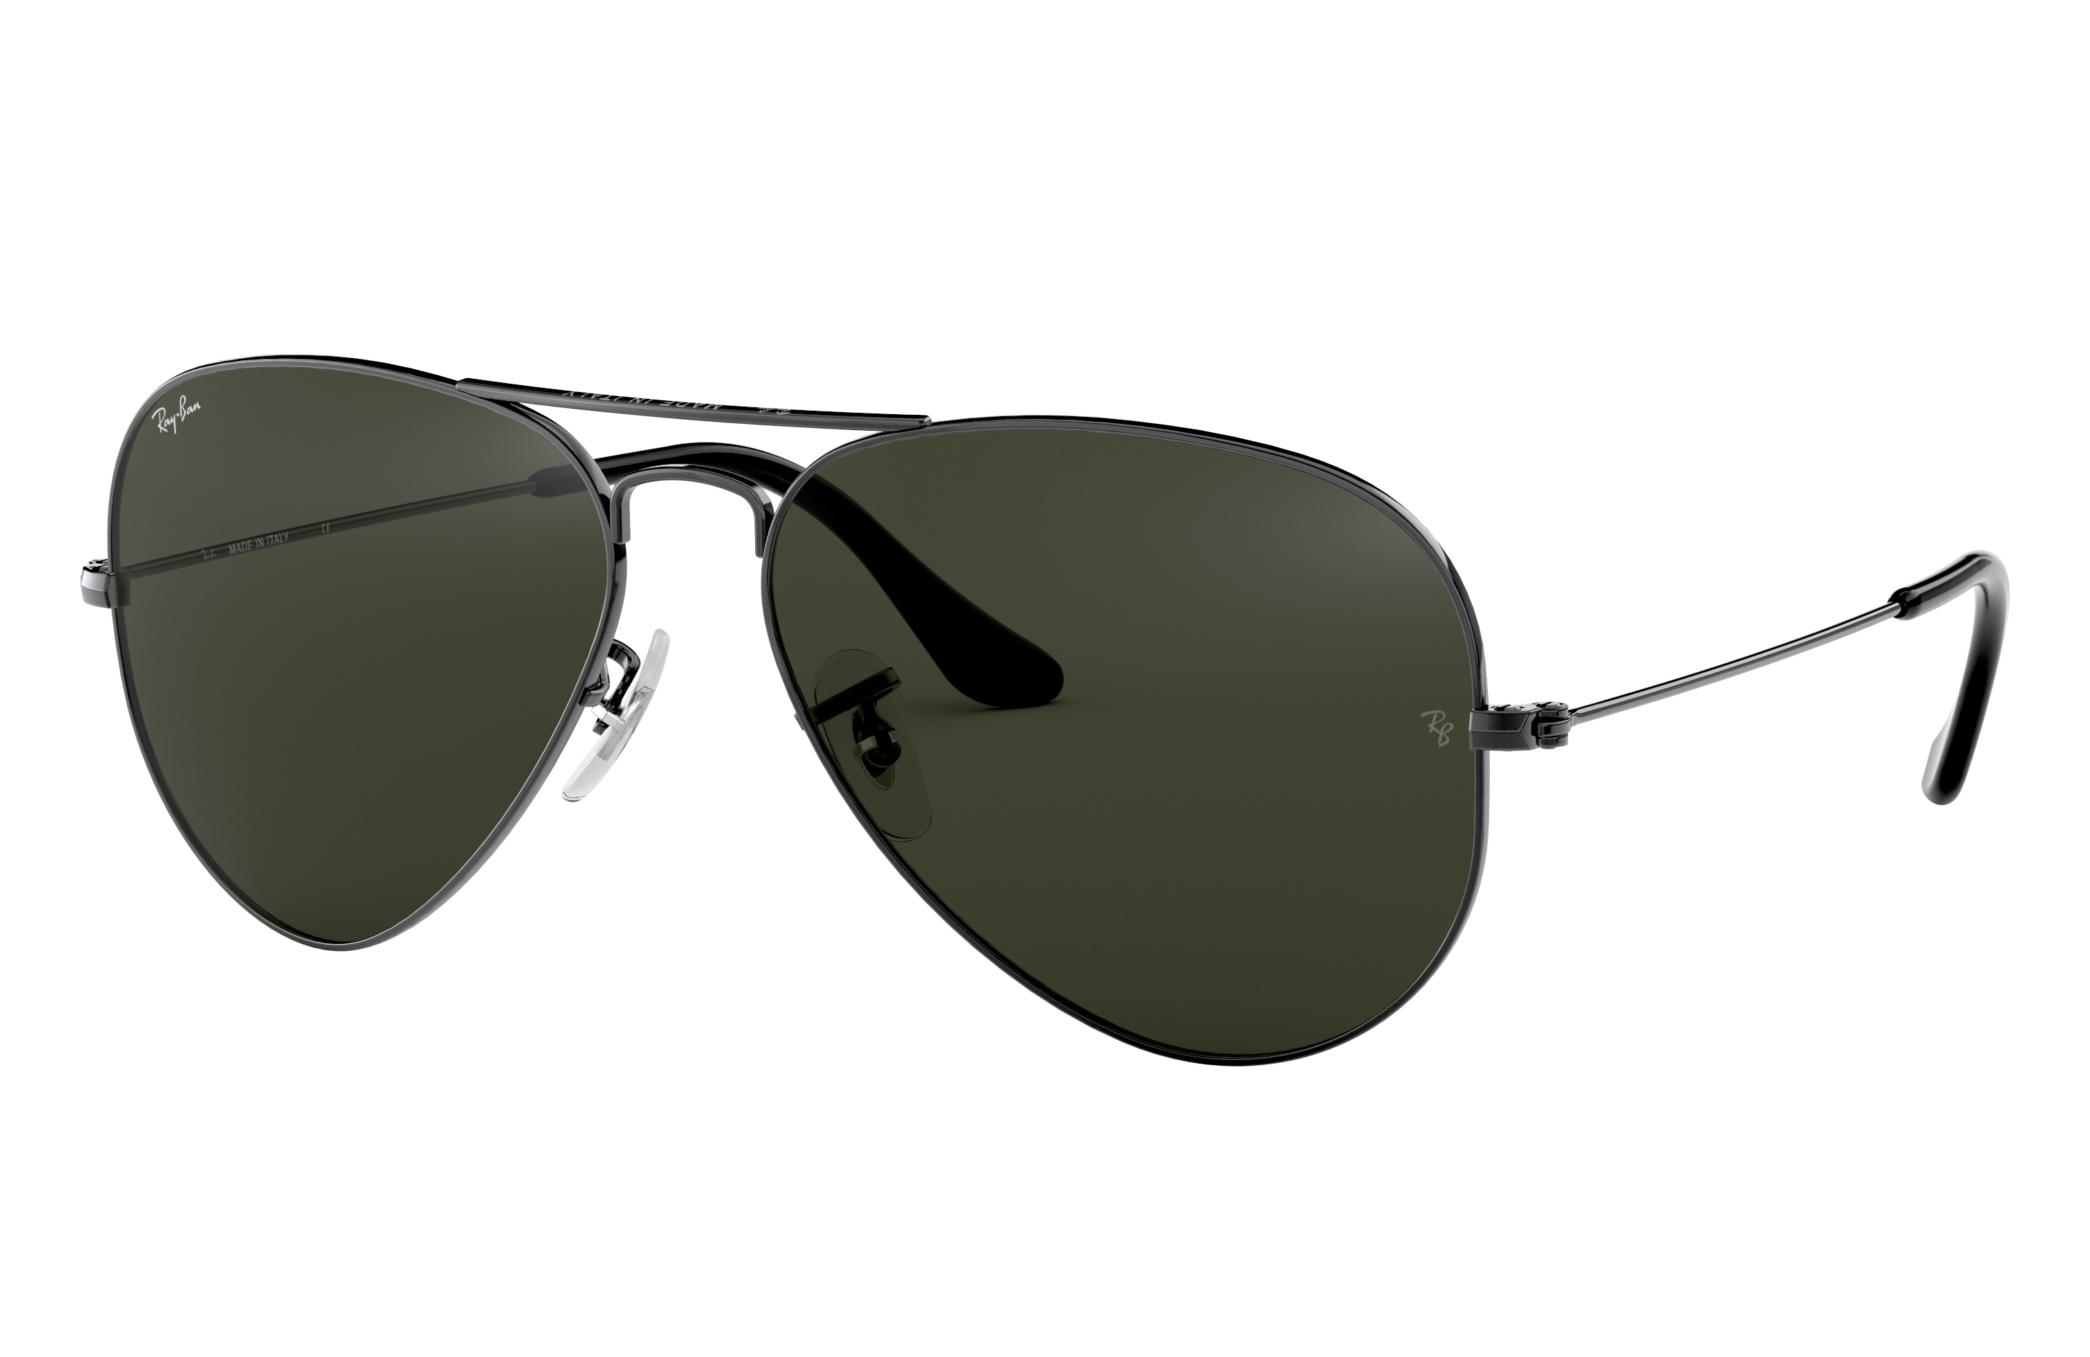 Ray-Ban Aviator Classic Gunmetal, Green Lenses - RB3025